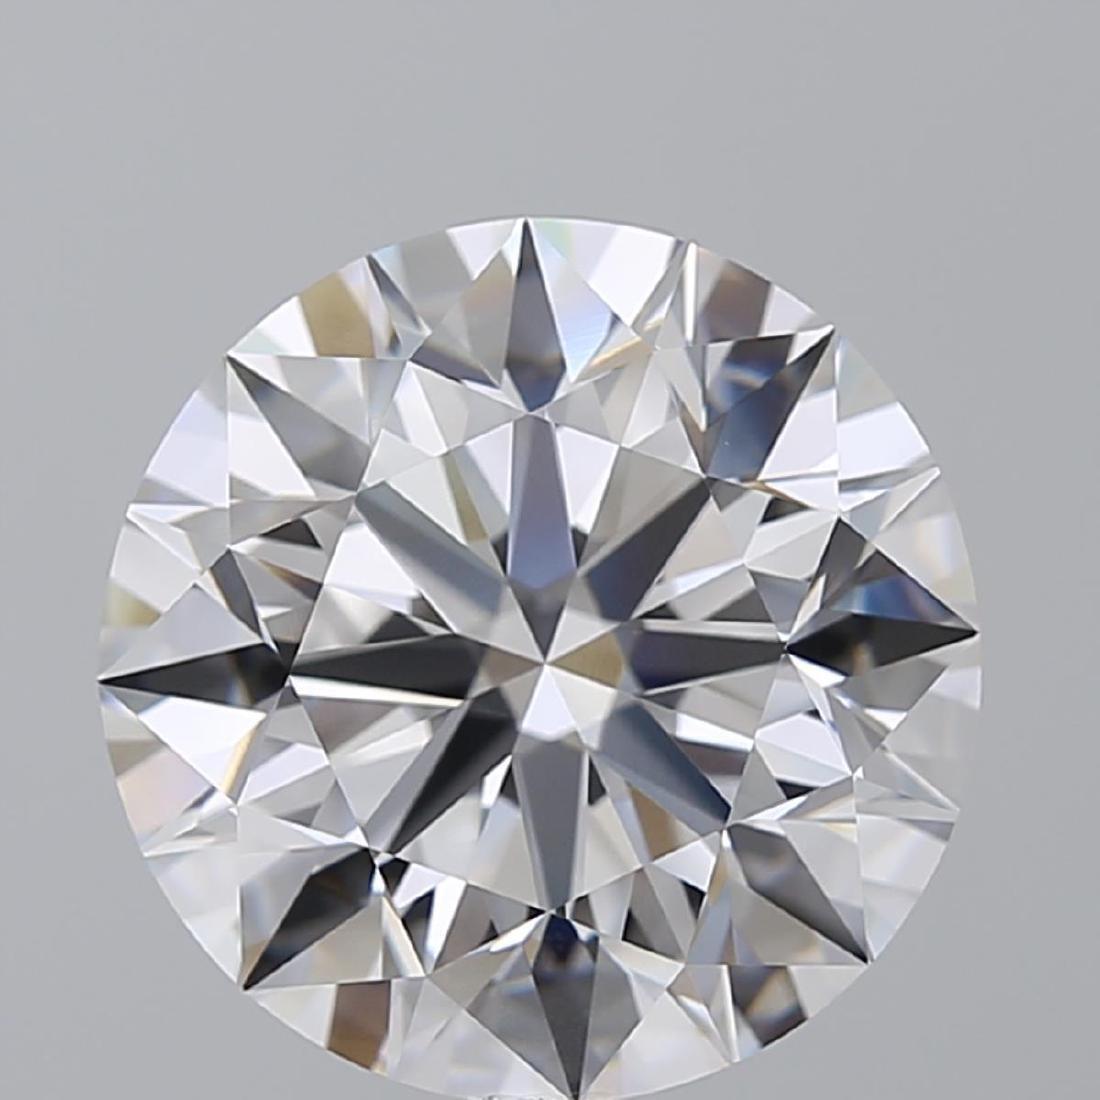 8.01 ct, Color D/FL, Round cut Diamond - 2